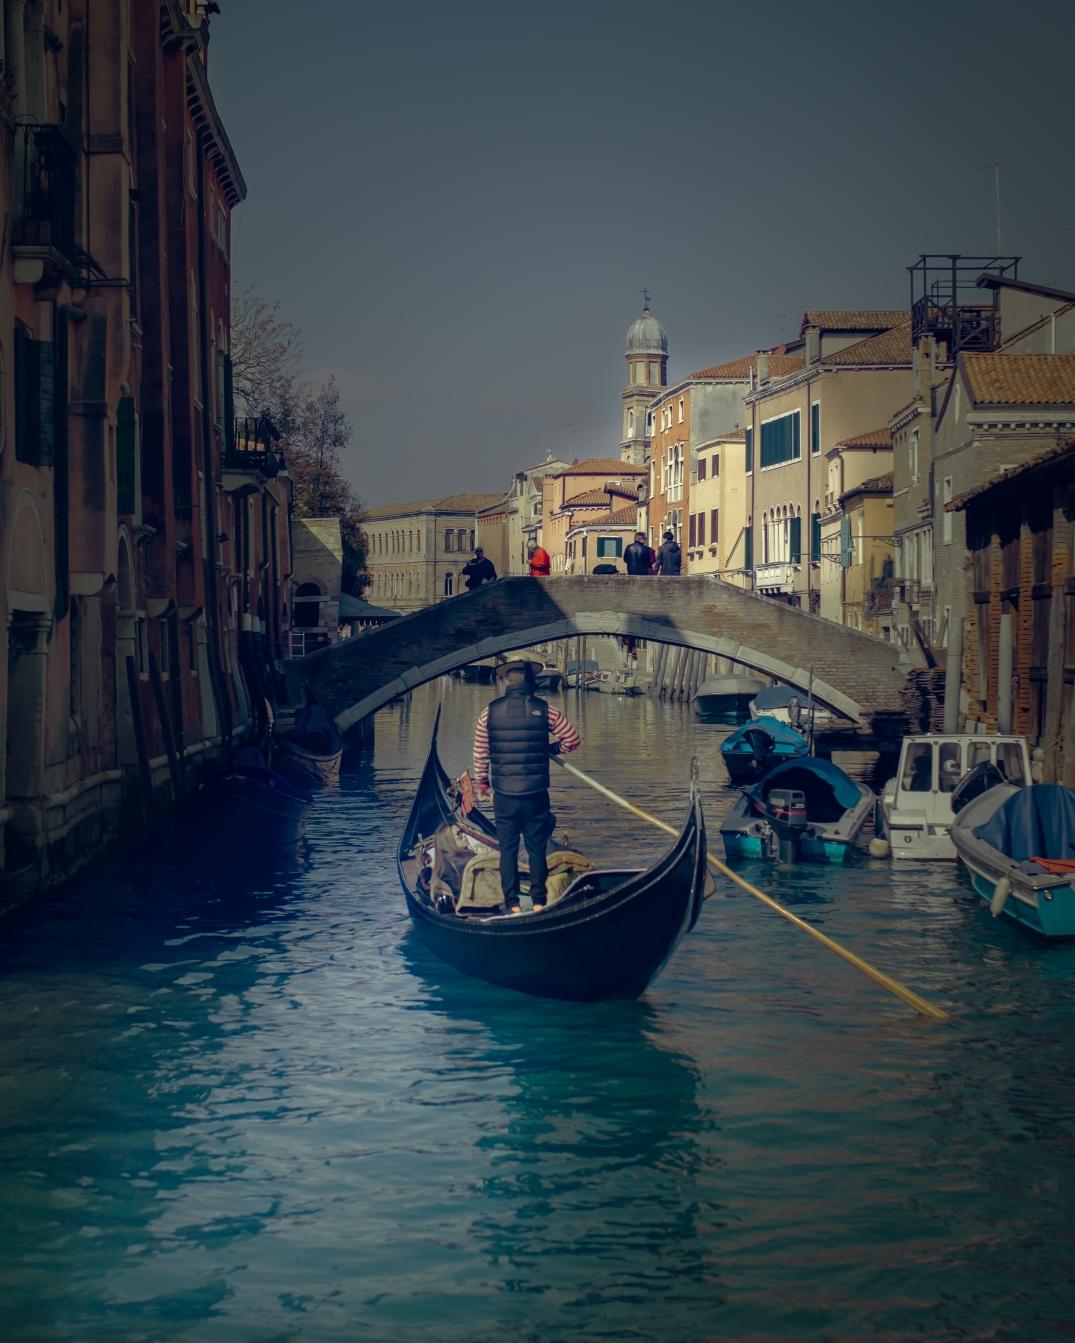 venezia märz 19 gondel 2